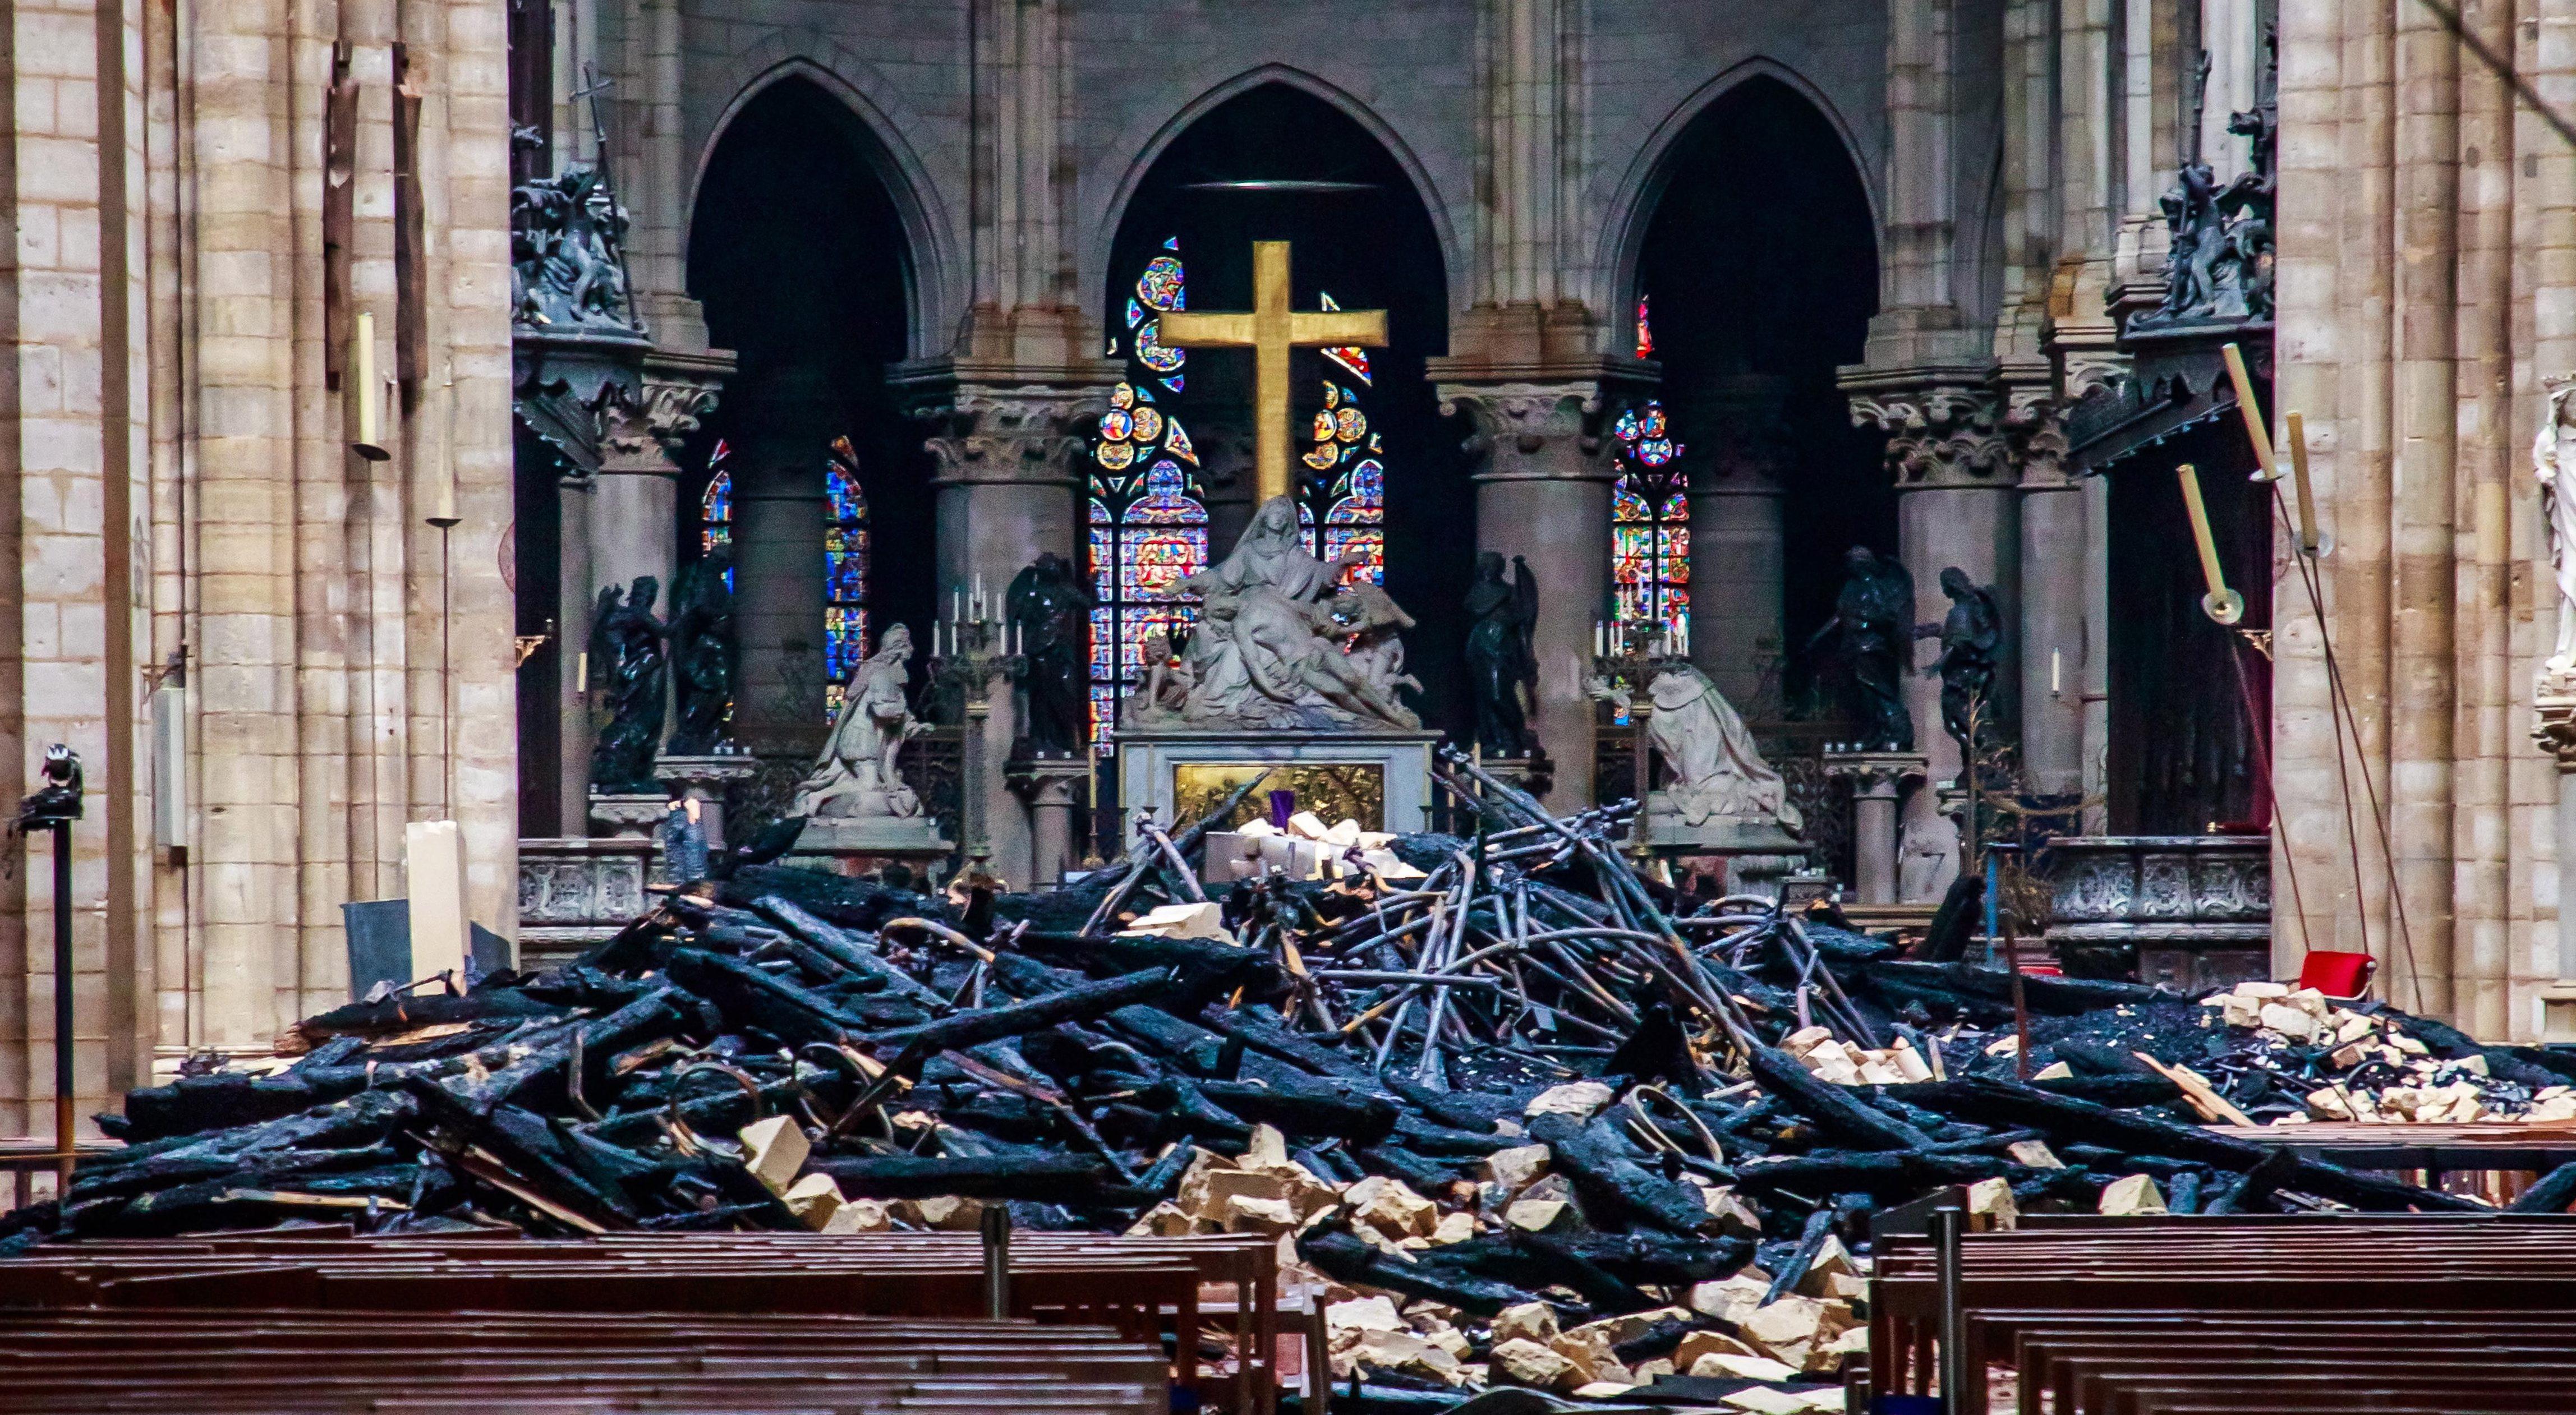 Notre-Dame 2019